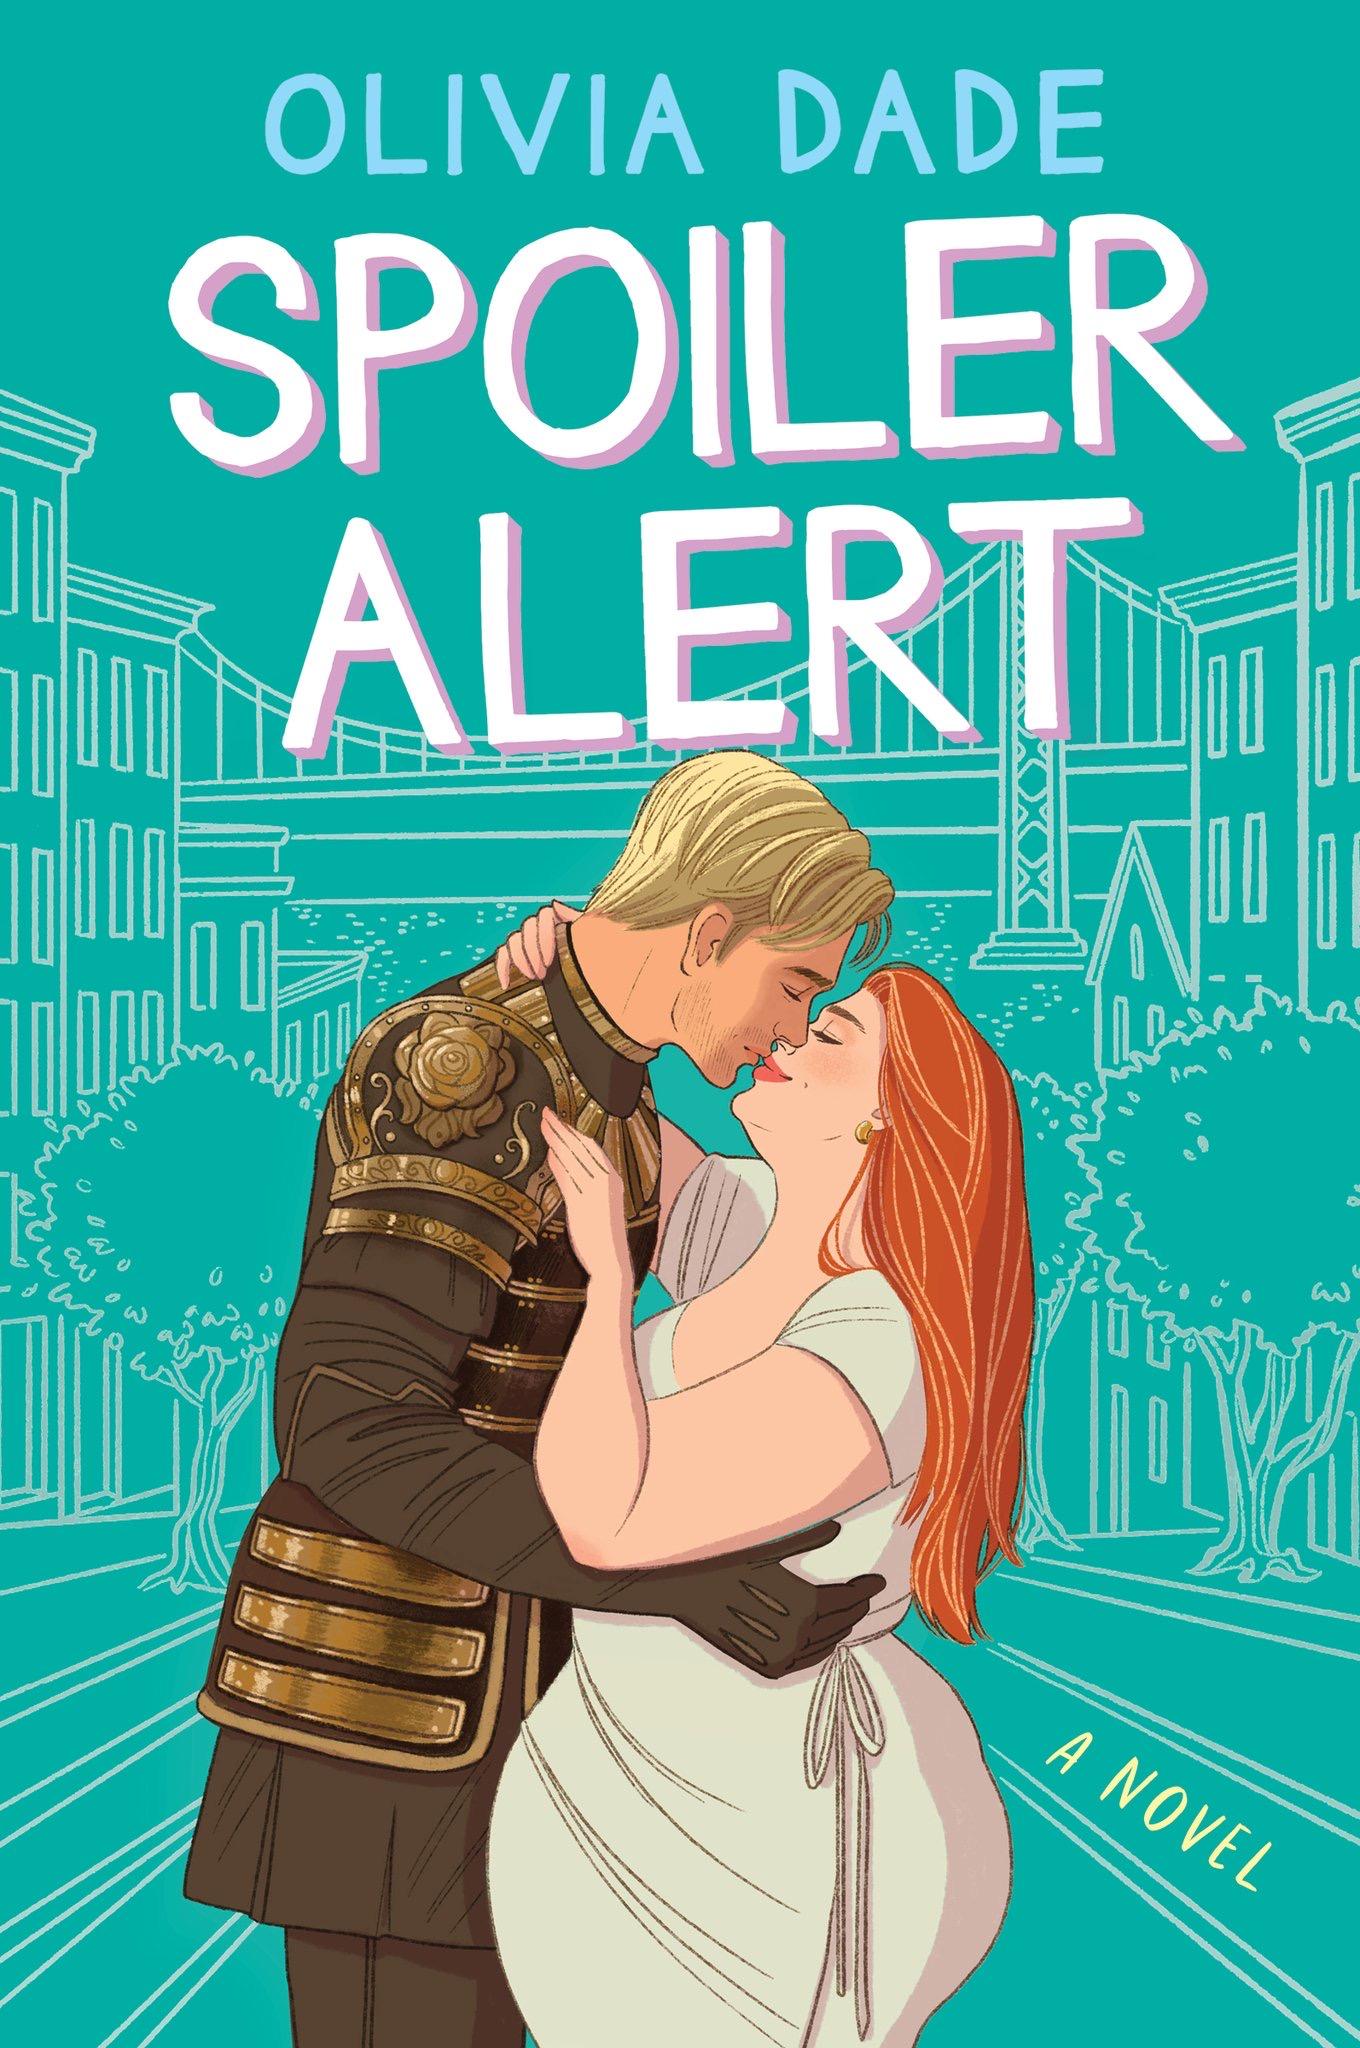 Spoiler Alert by Olivia Dade